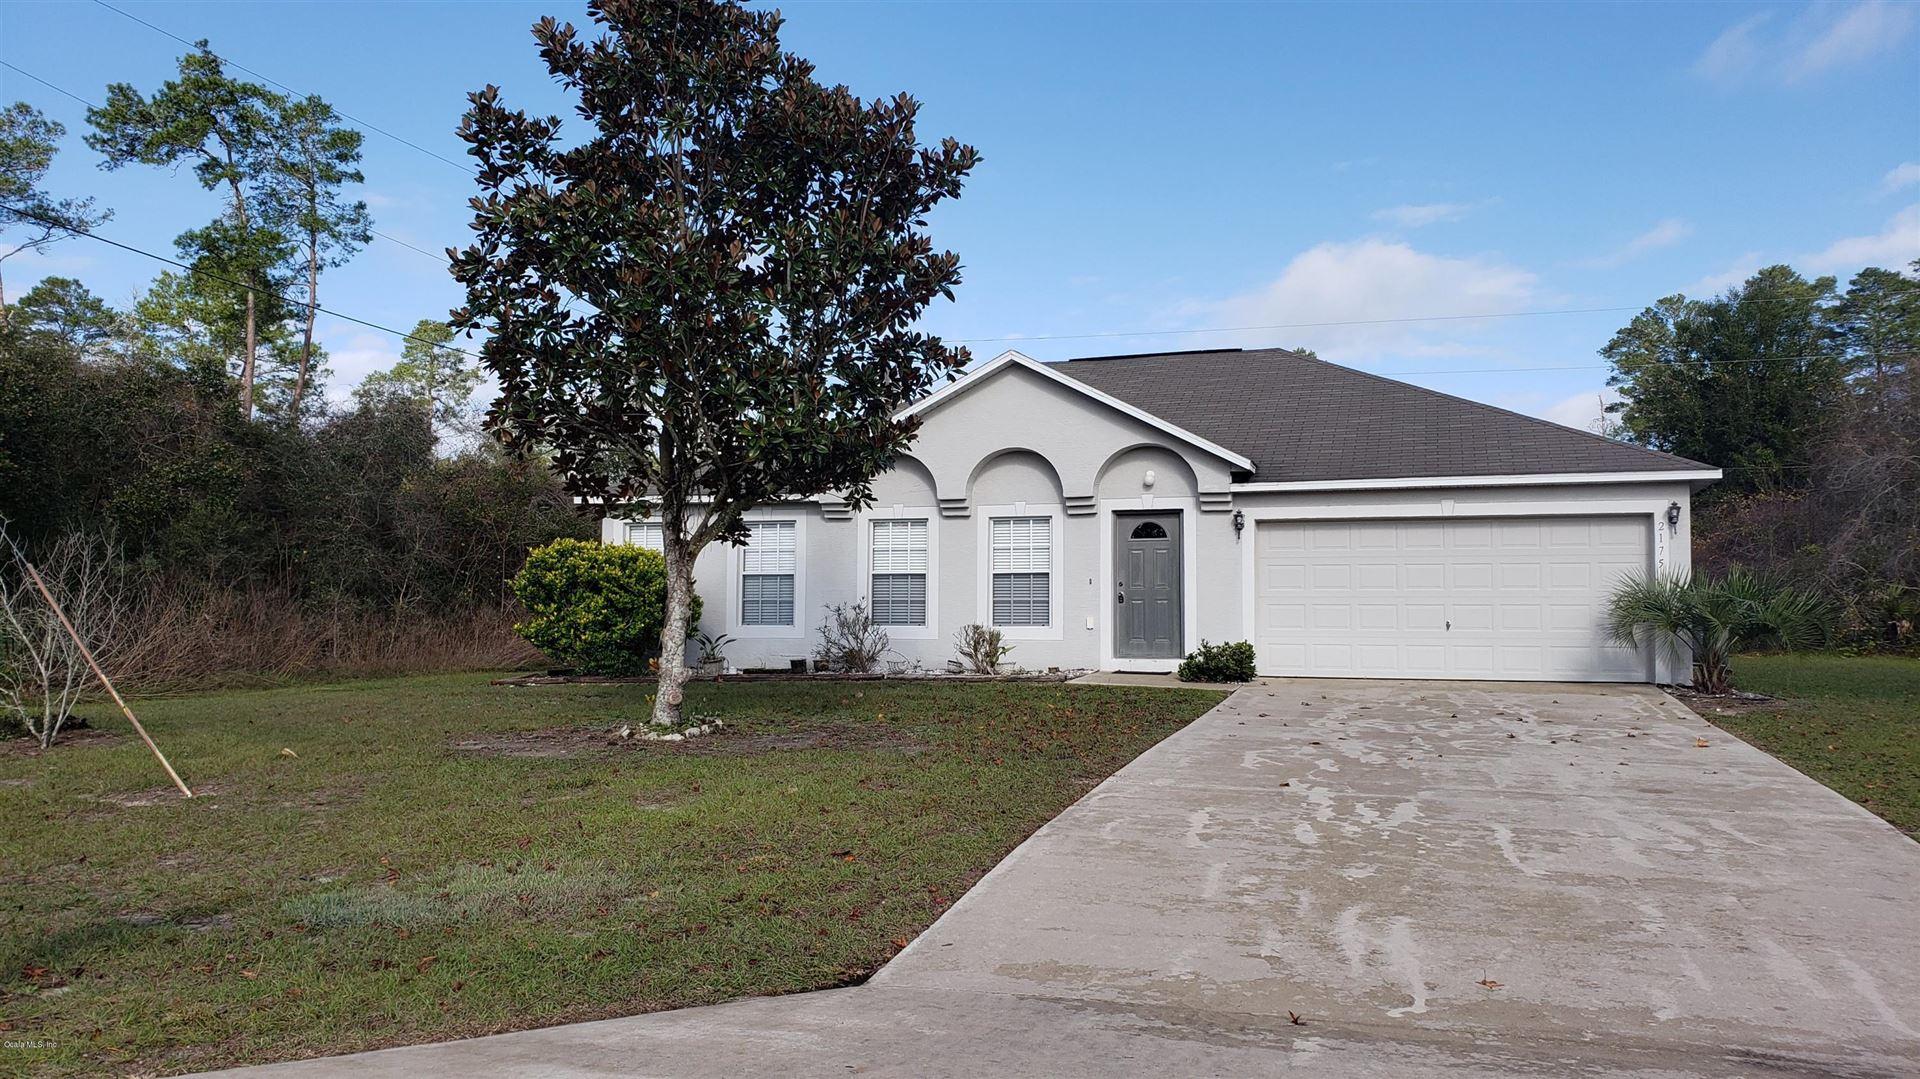 2175 SW 153rd Place, Ocala, FL 34473 - MLS#: 567912